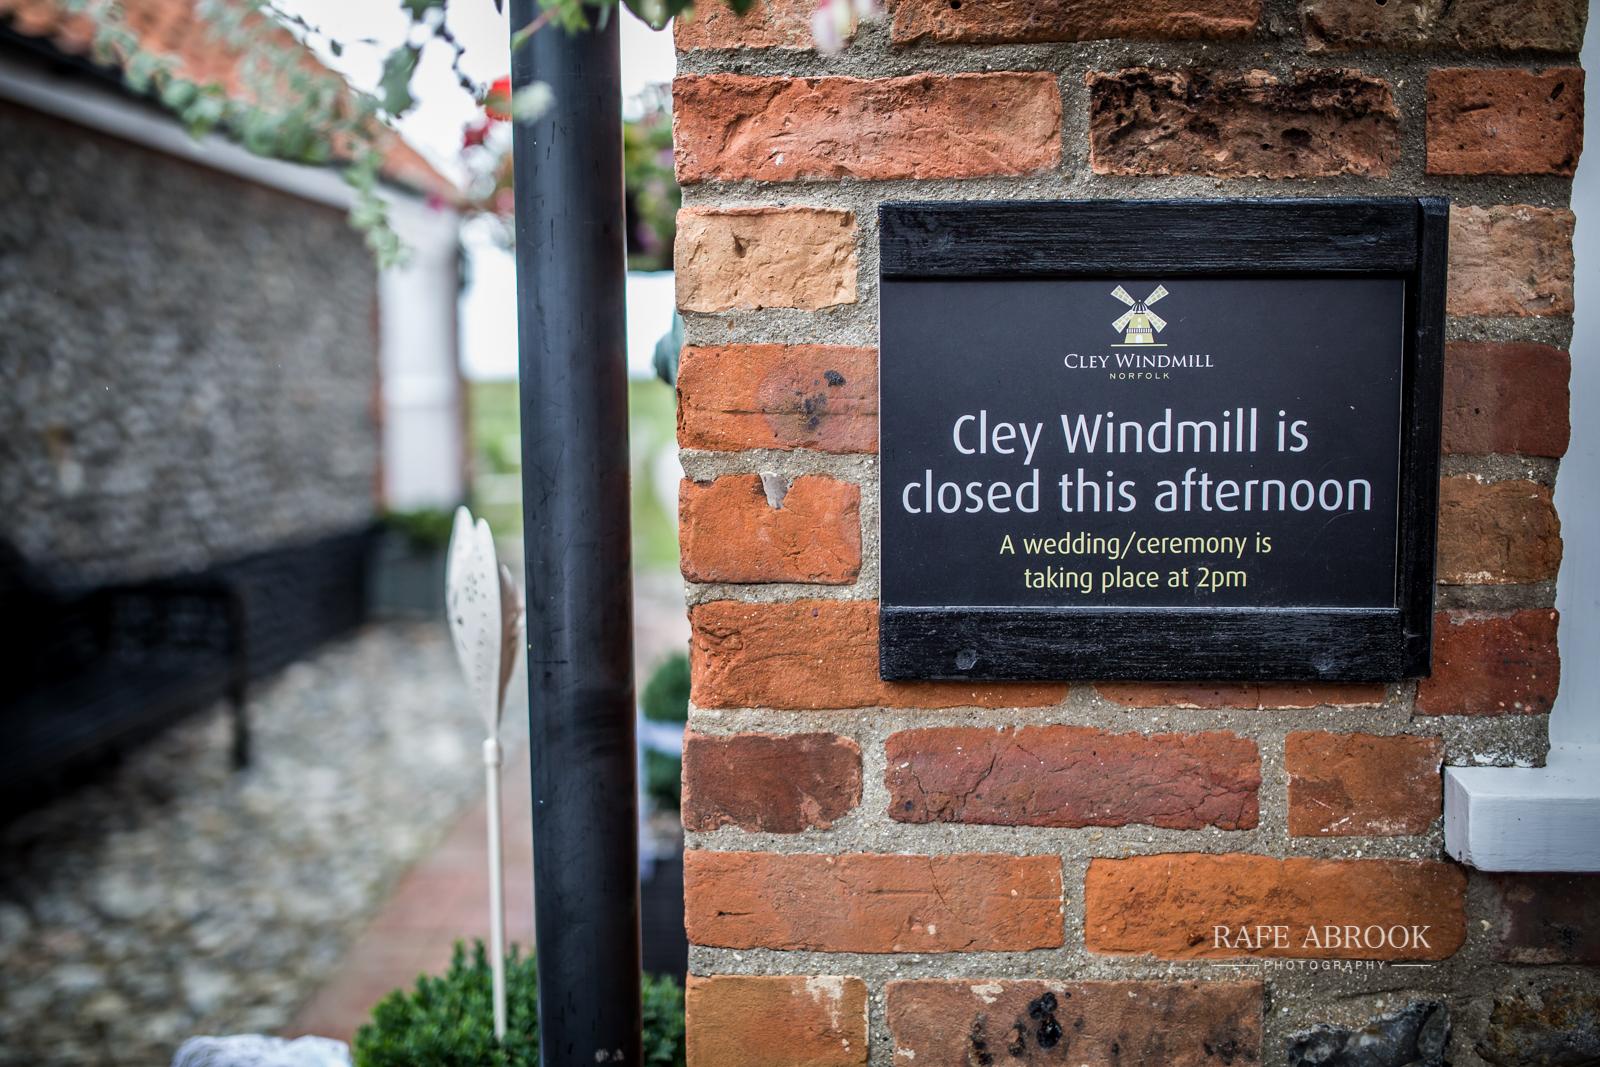 cley windmill wedding norfolk hertfordshire wedding photographer-1059.jpg